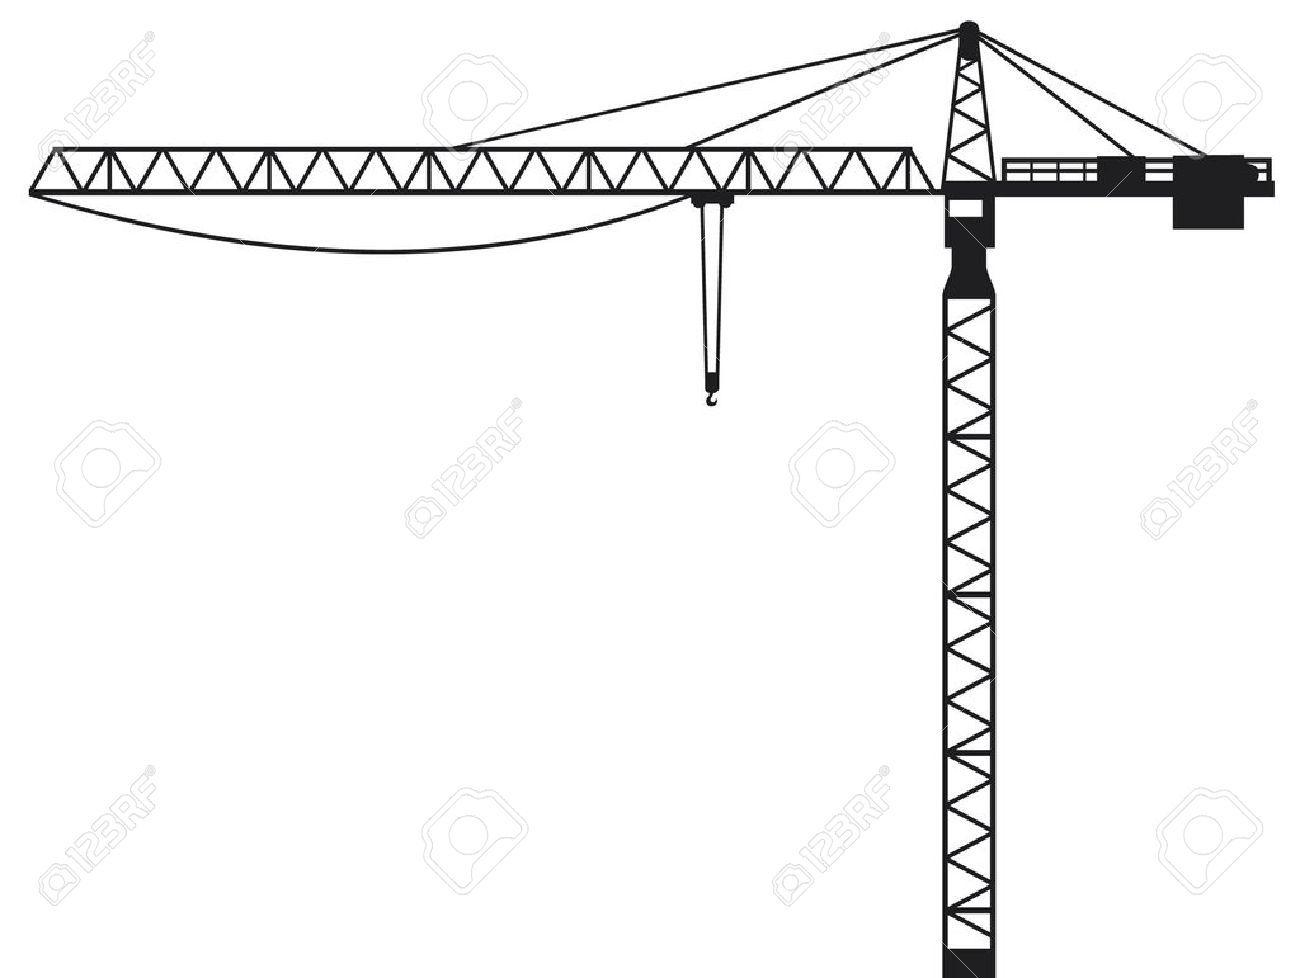 1300x978 Pin By Daniel Burke On Cranes Trusses And Bridges